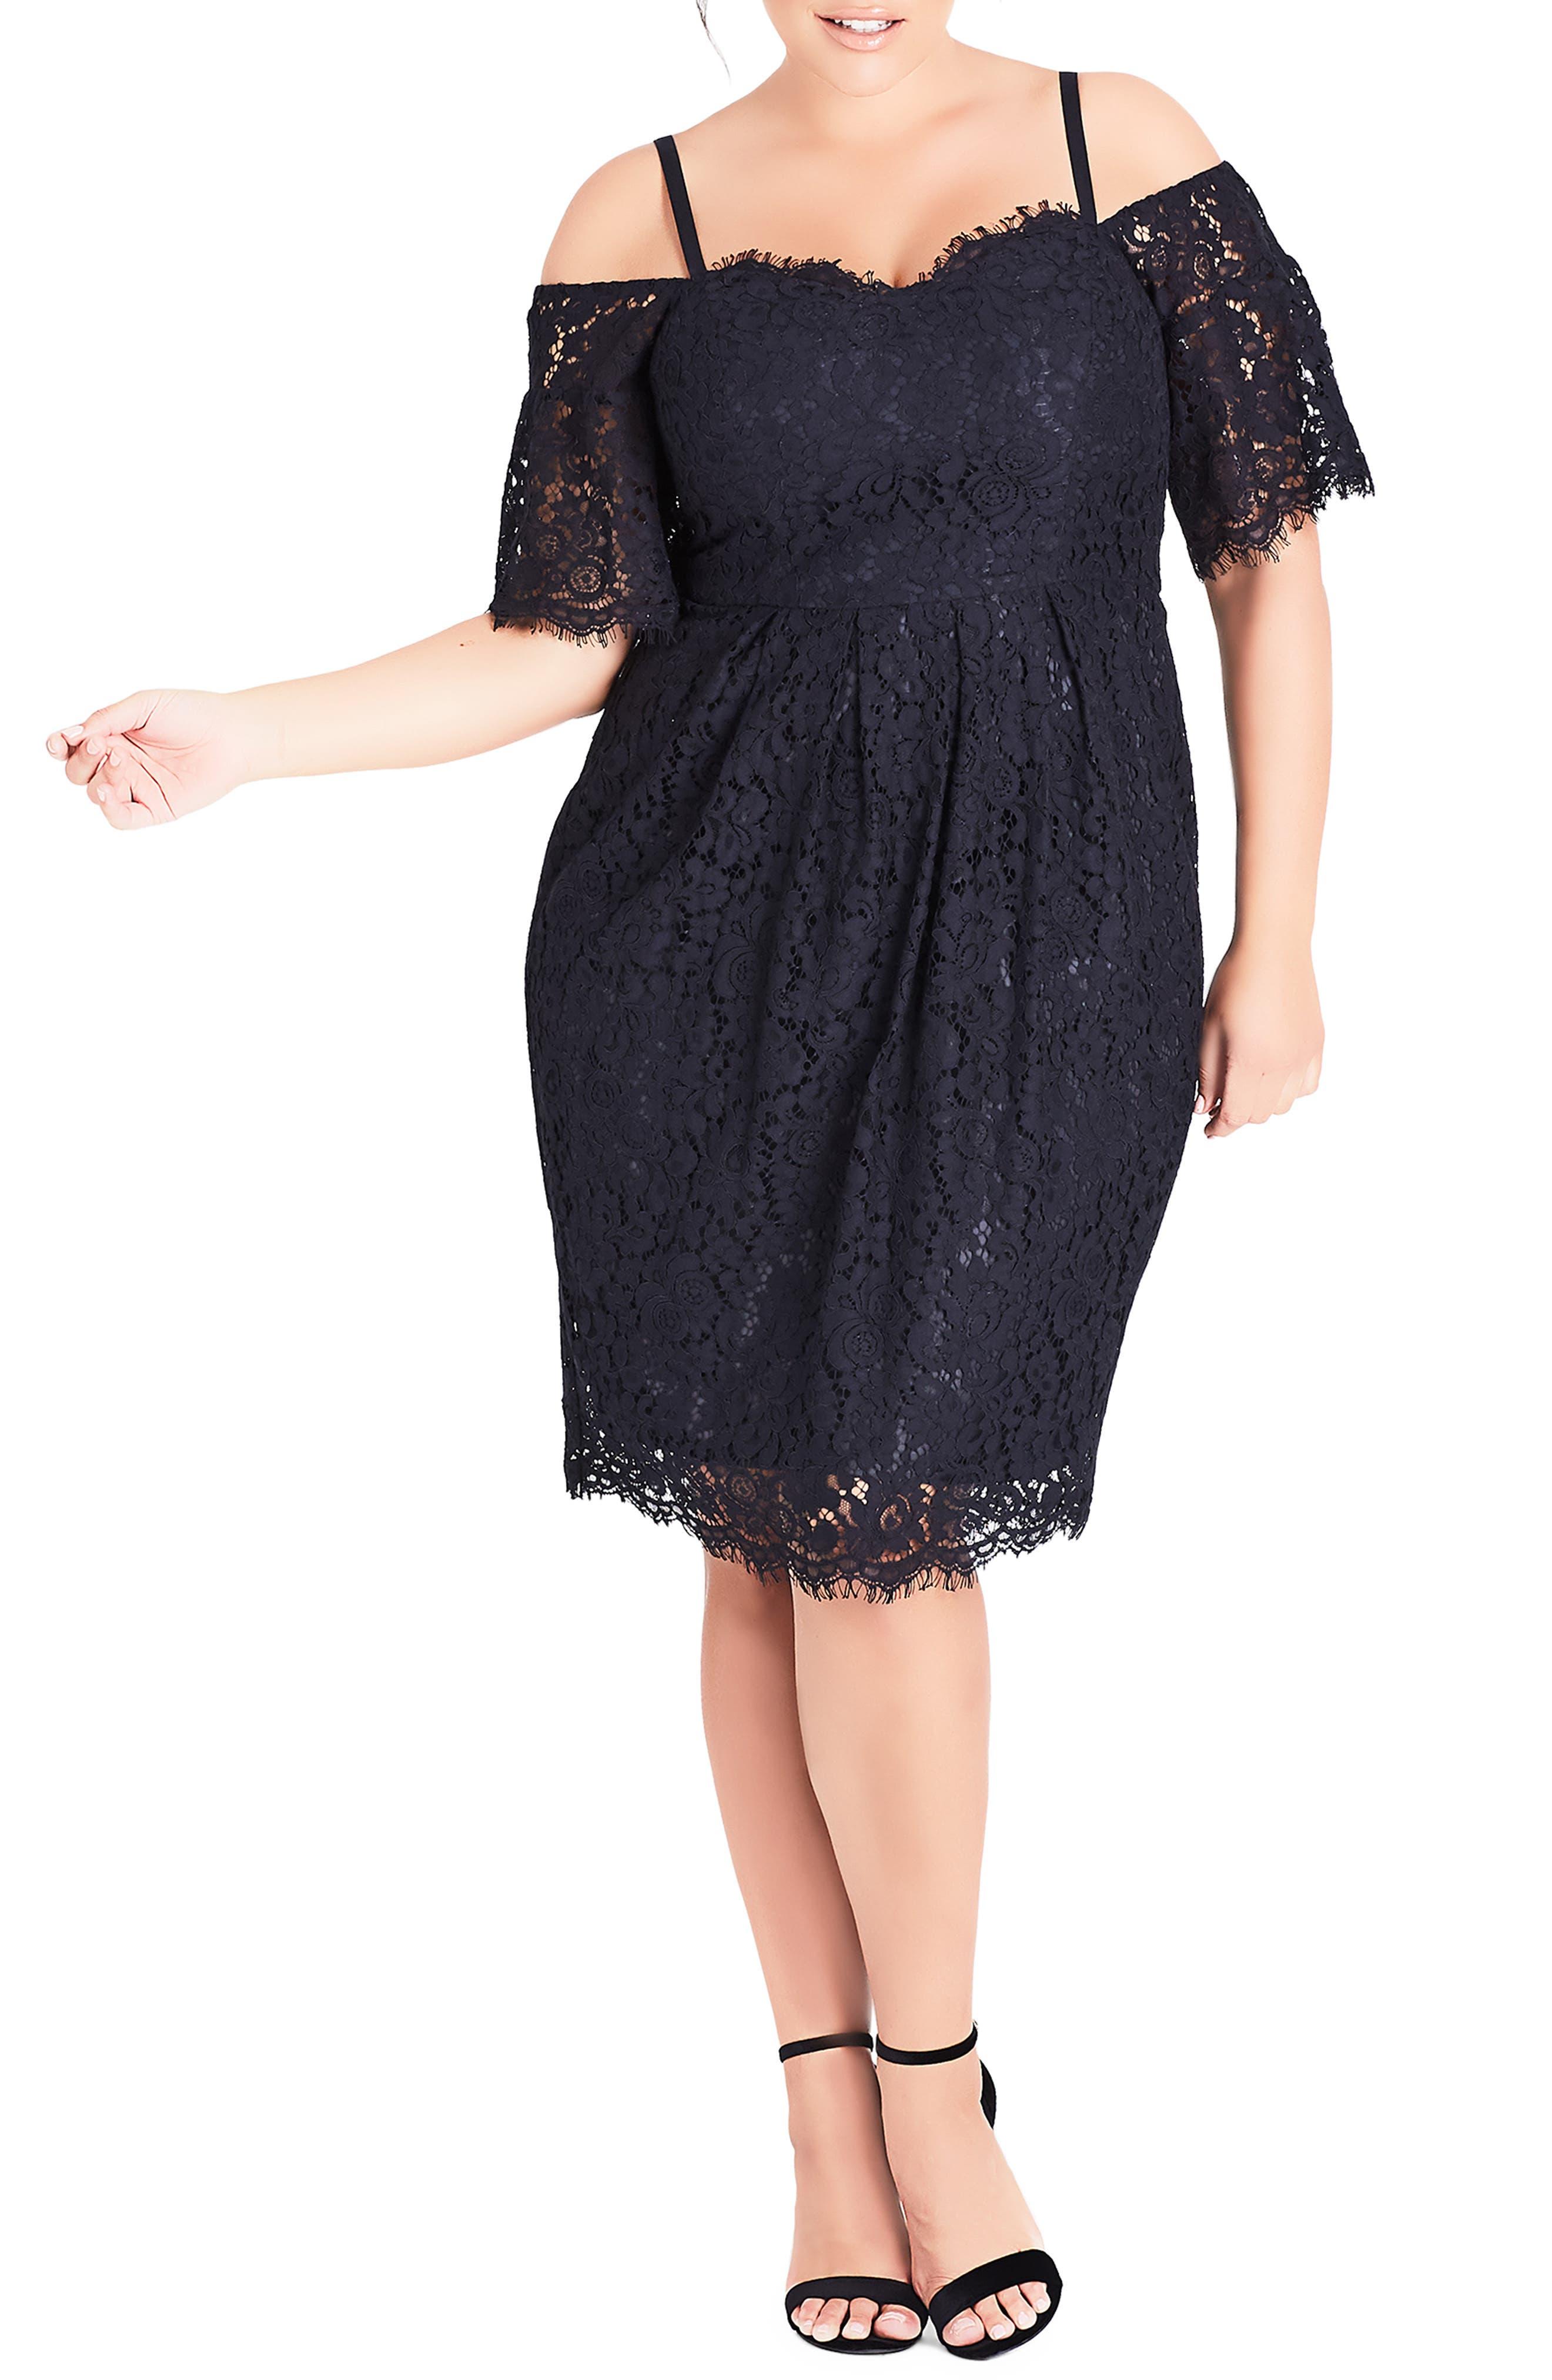 CITY CHIC, Amour Cold Shoulder Lace Sheath Dress, Main thumbnail 1, color, NAVY